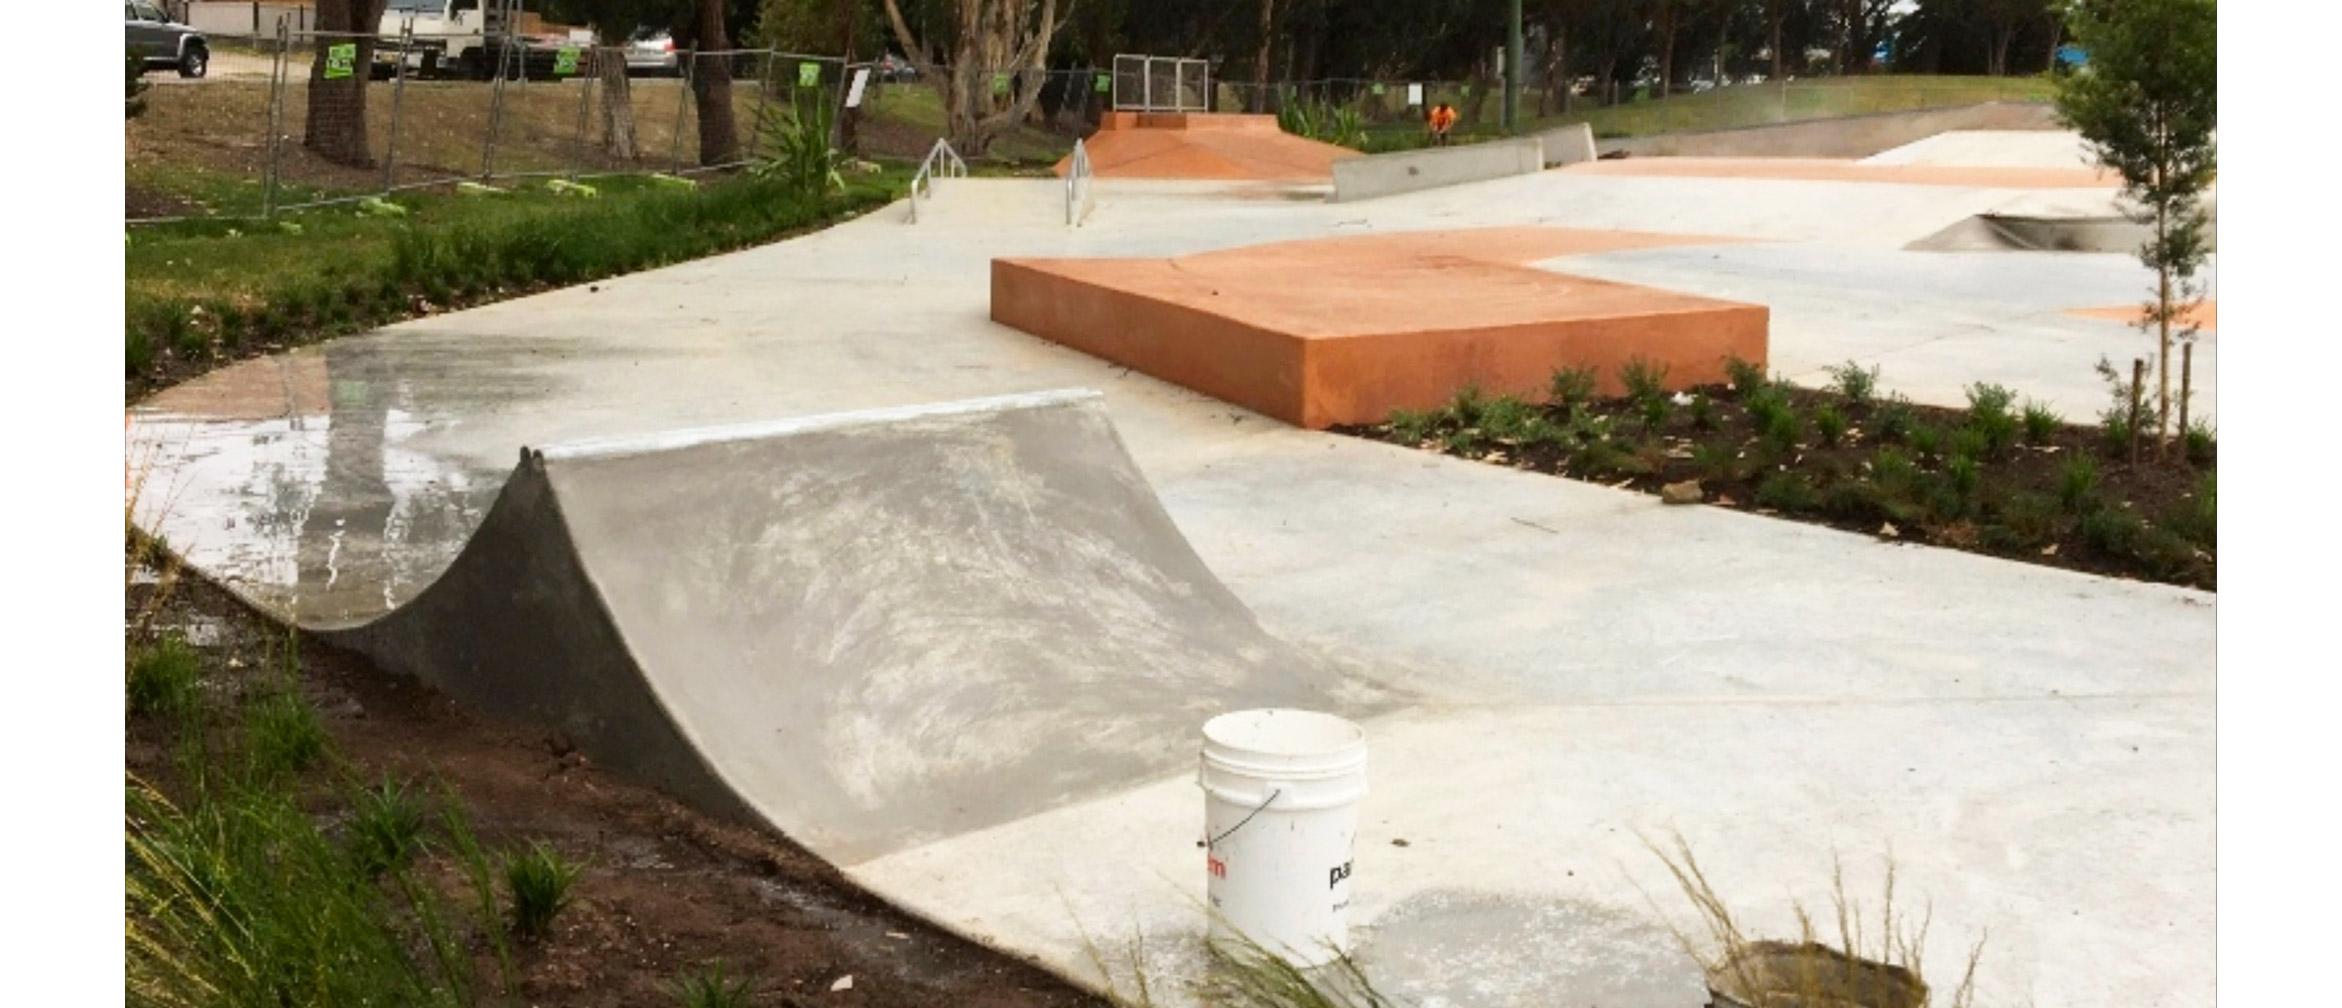 Cromer skate park spine and manual pad